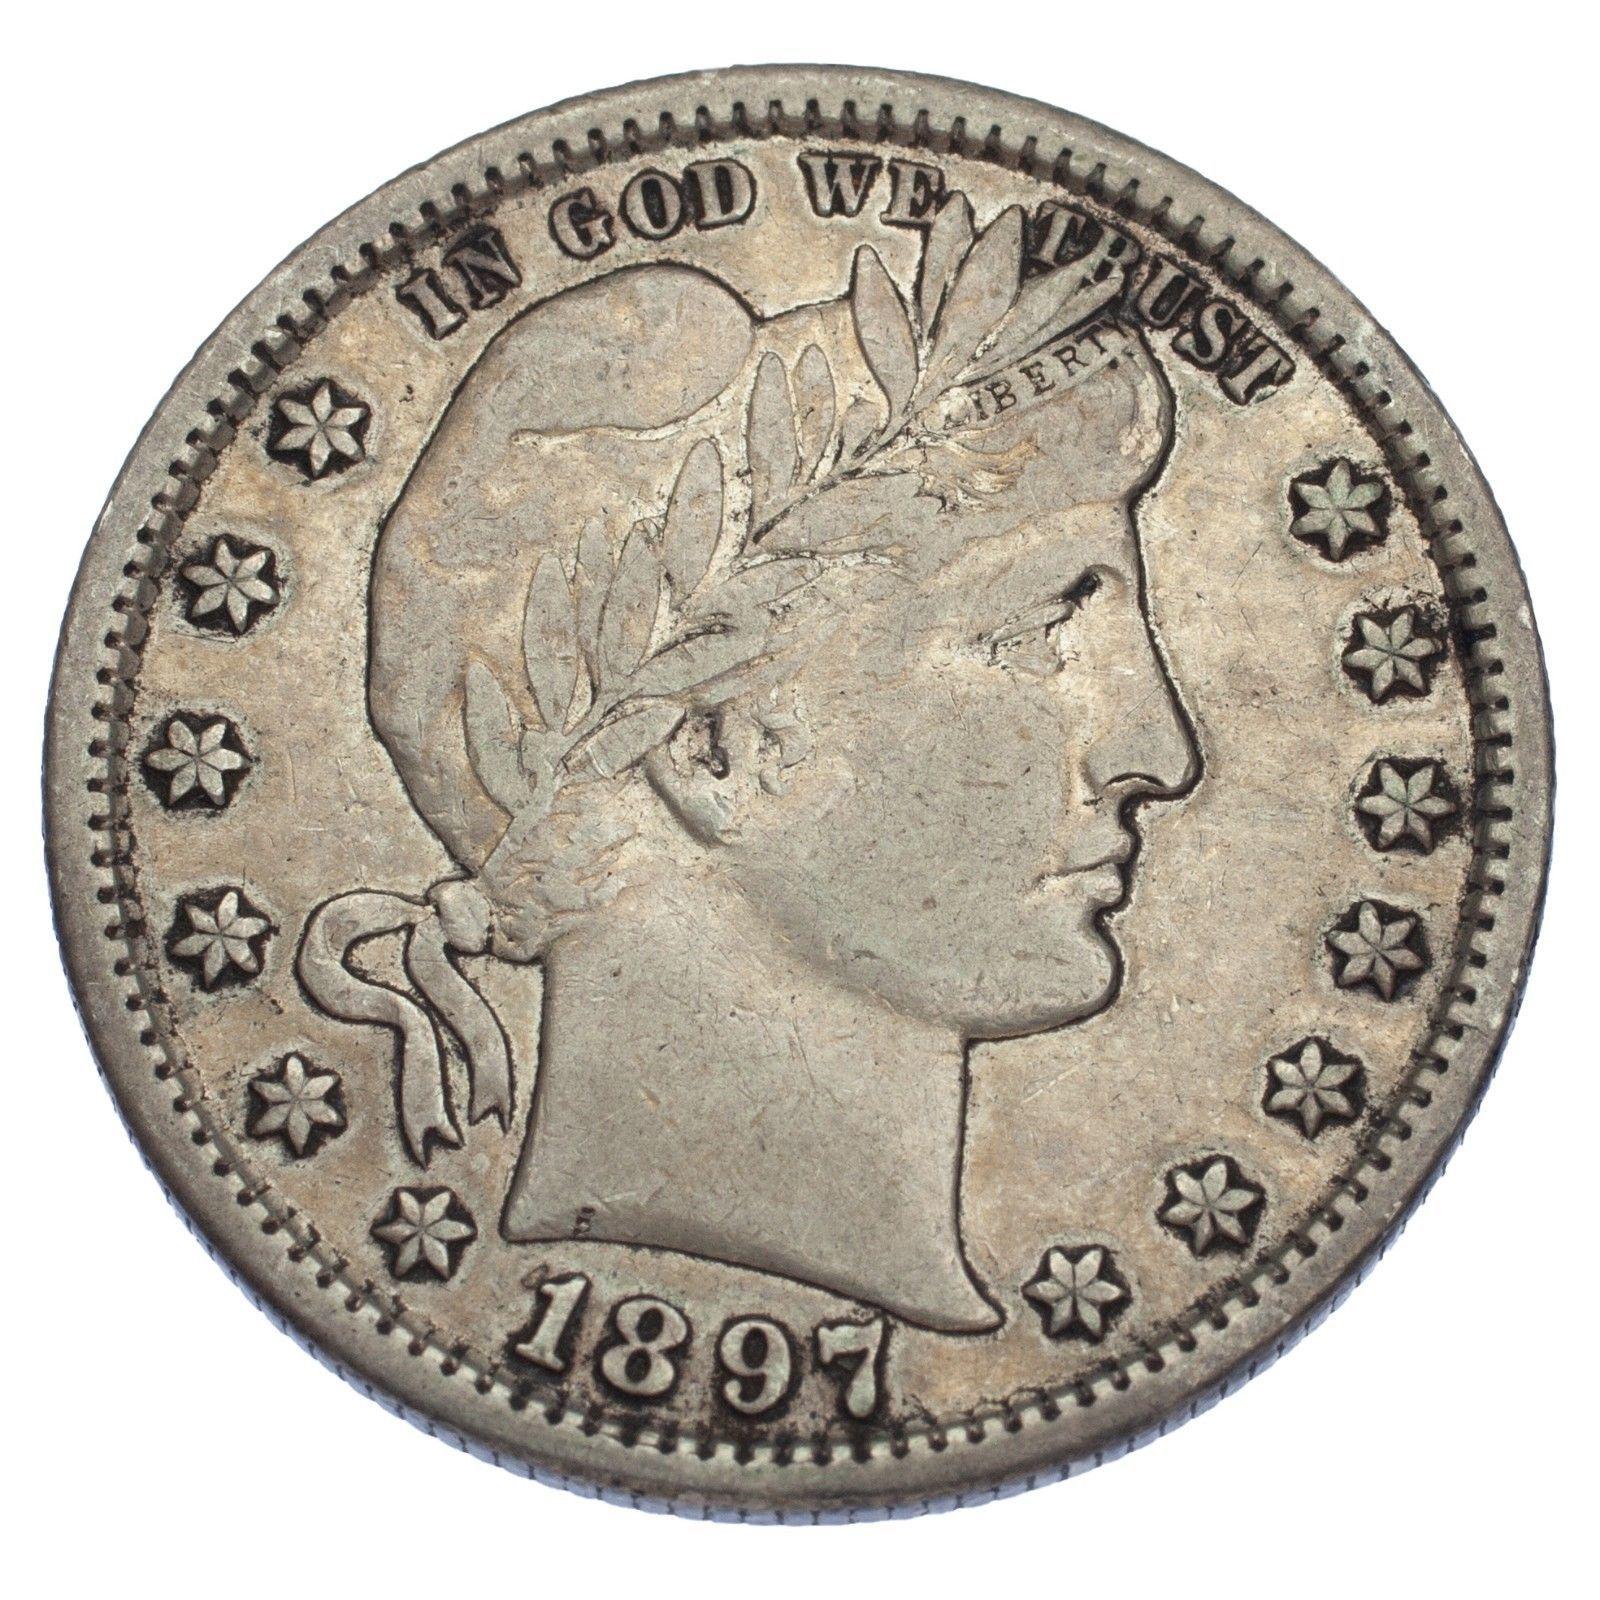 1897-S 25C Barber Quarter (Very Fine, VF Condition) image 2